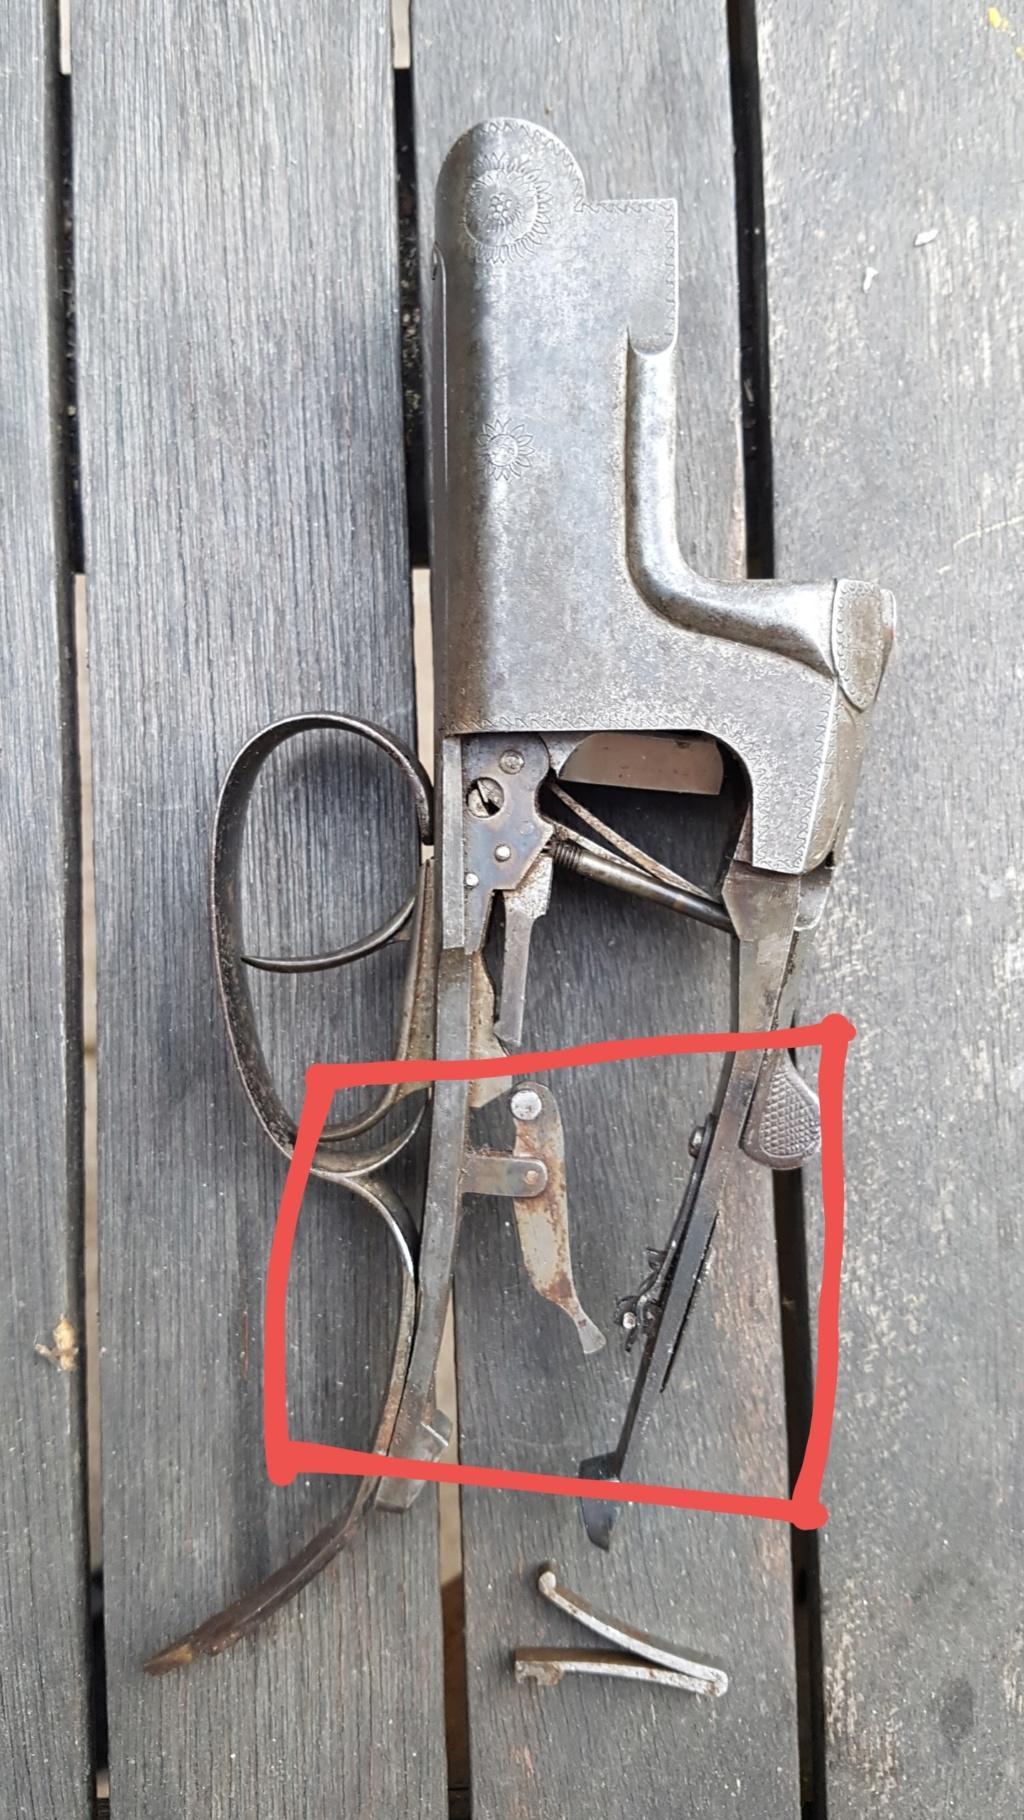 Vieux fusil à restaurer 20190413